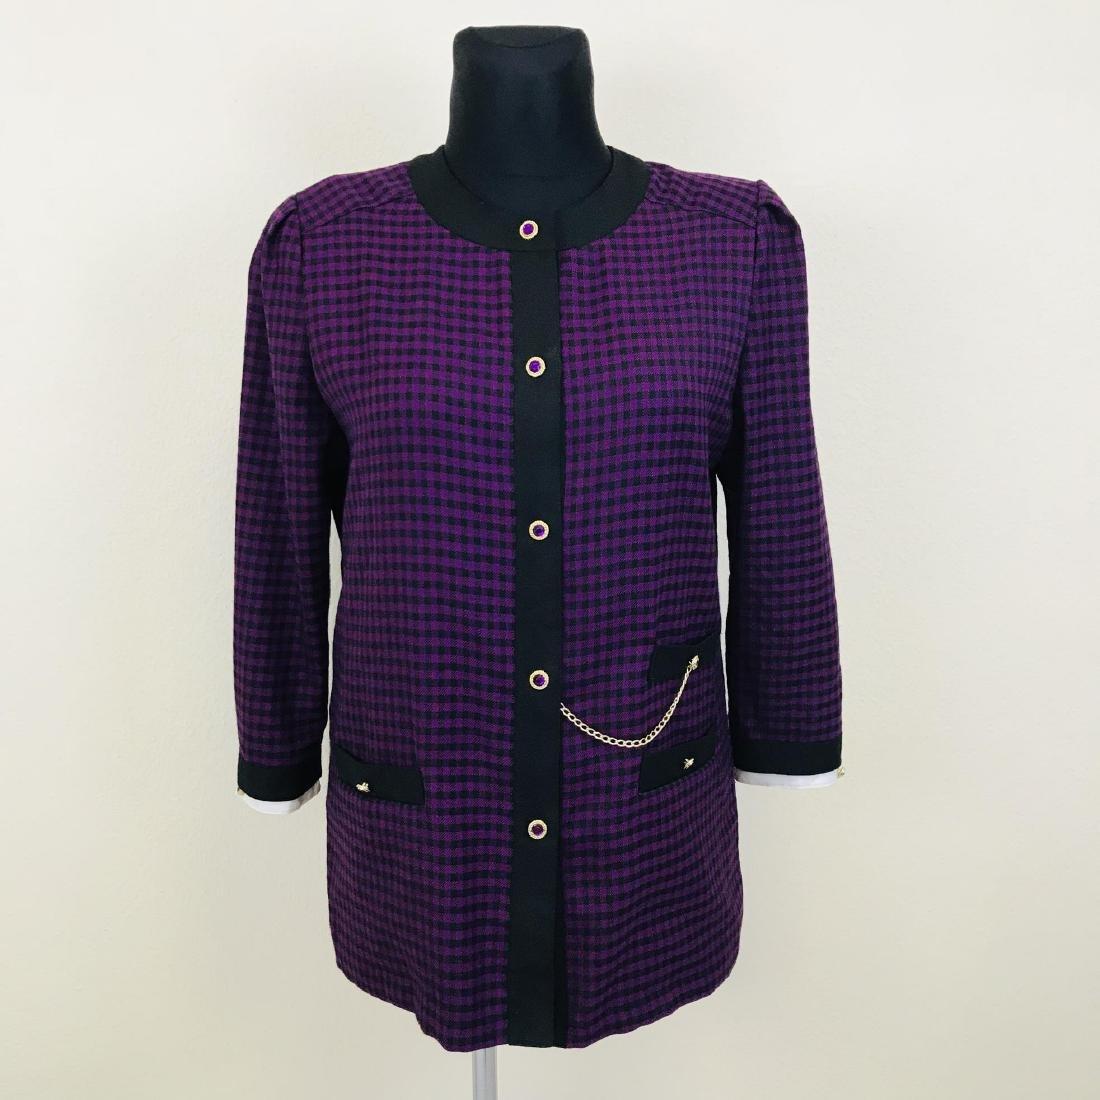 Vintage Women's Blazer Jacket